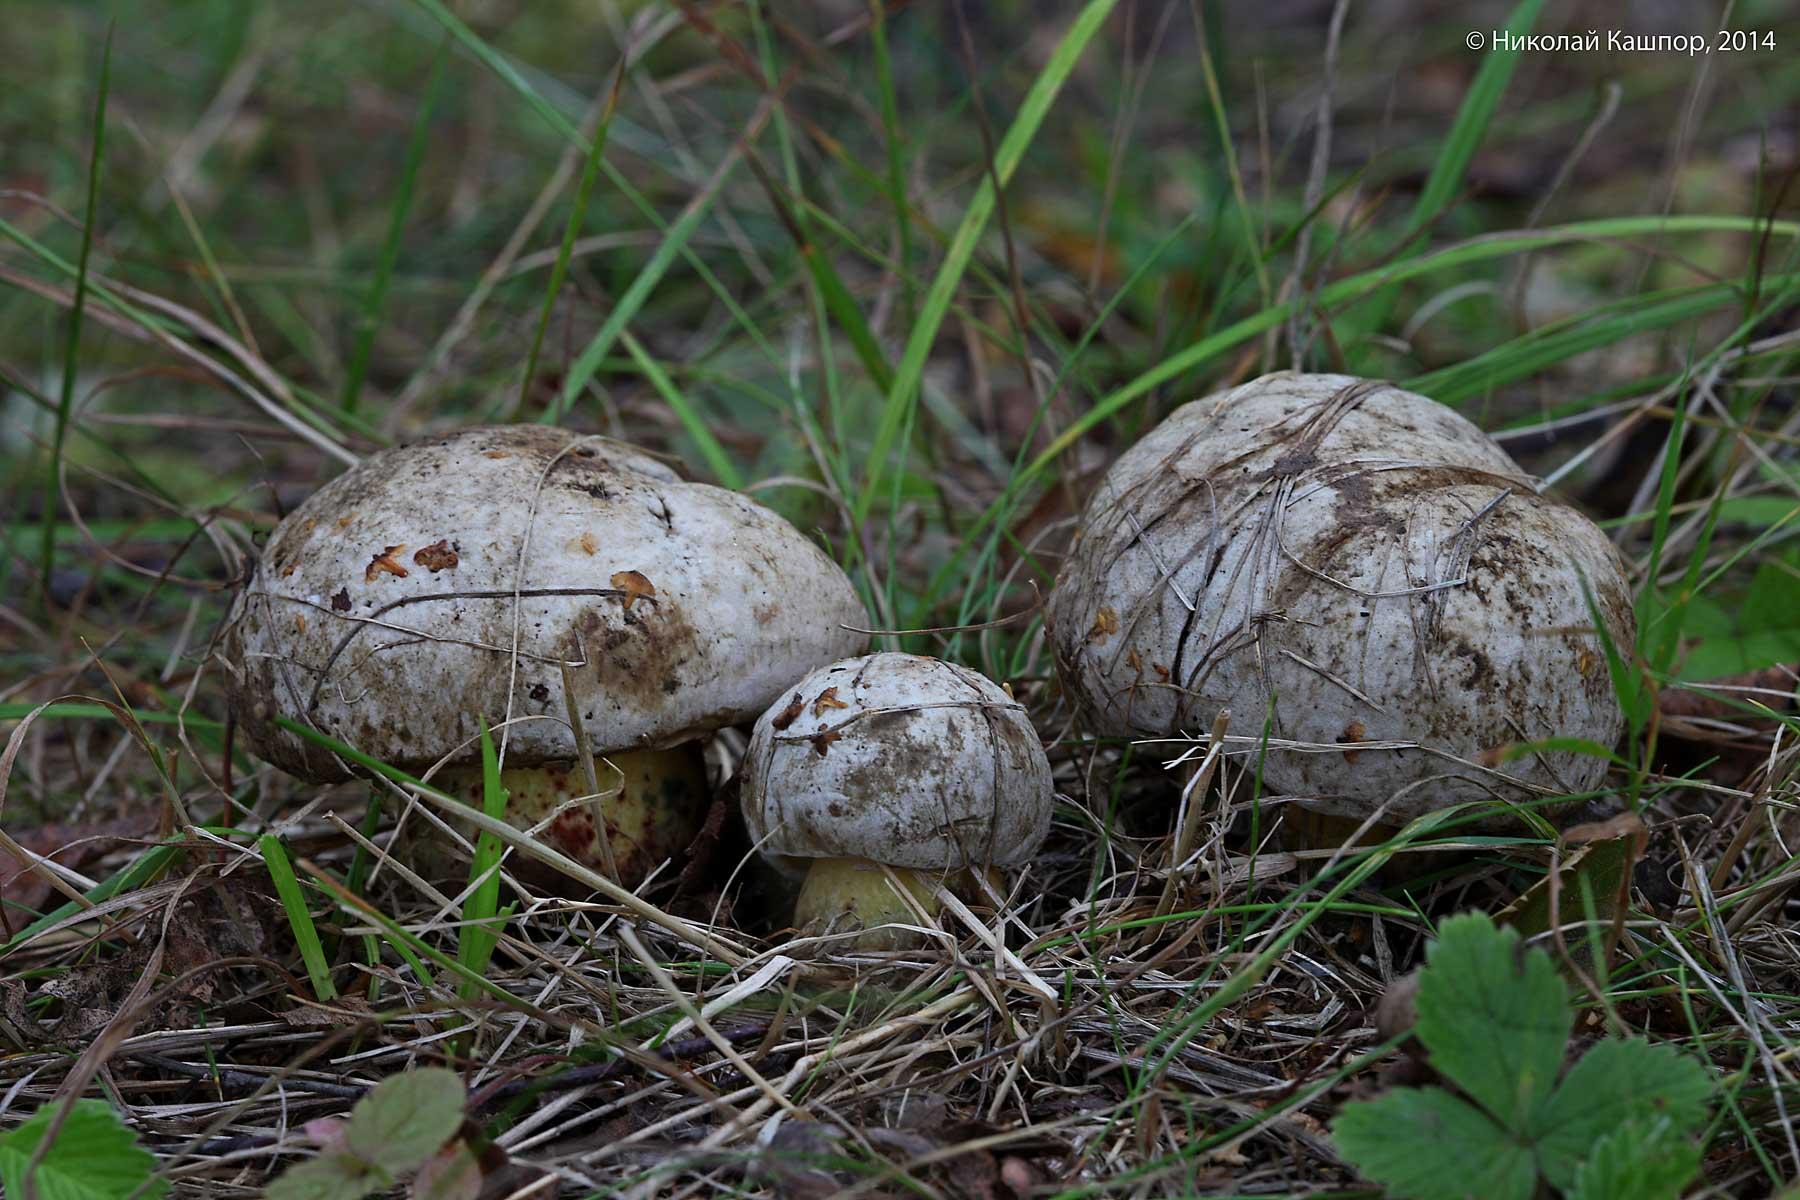 Болет глубокоукореняющийся (Boletus radicans). Автор фото:Кашпор Николай